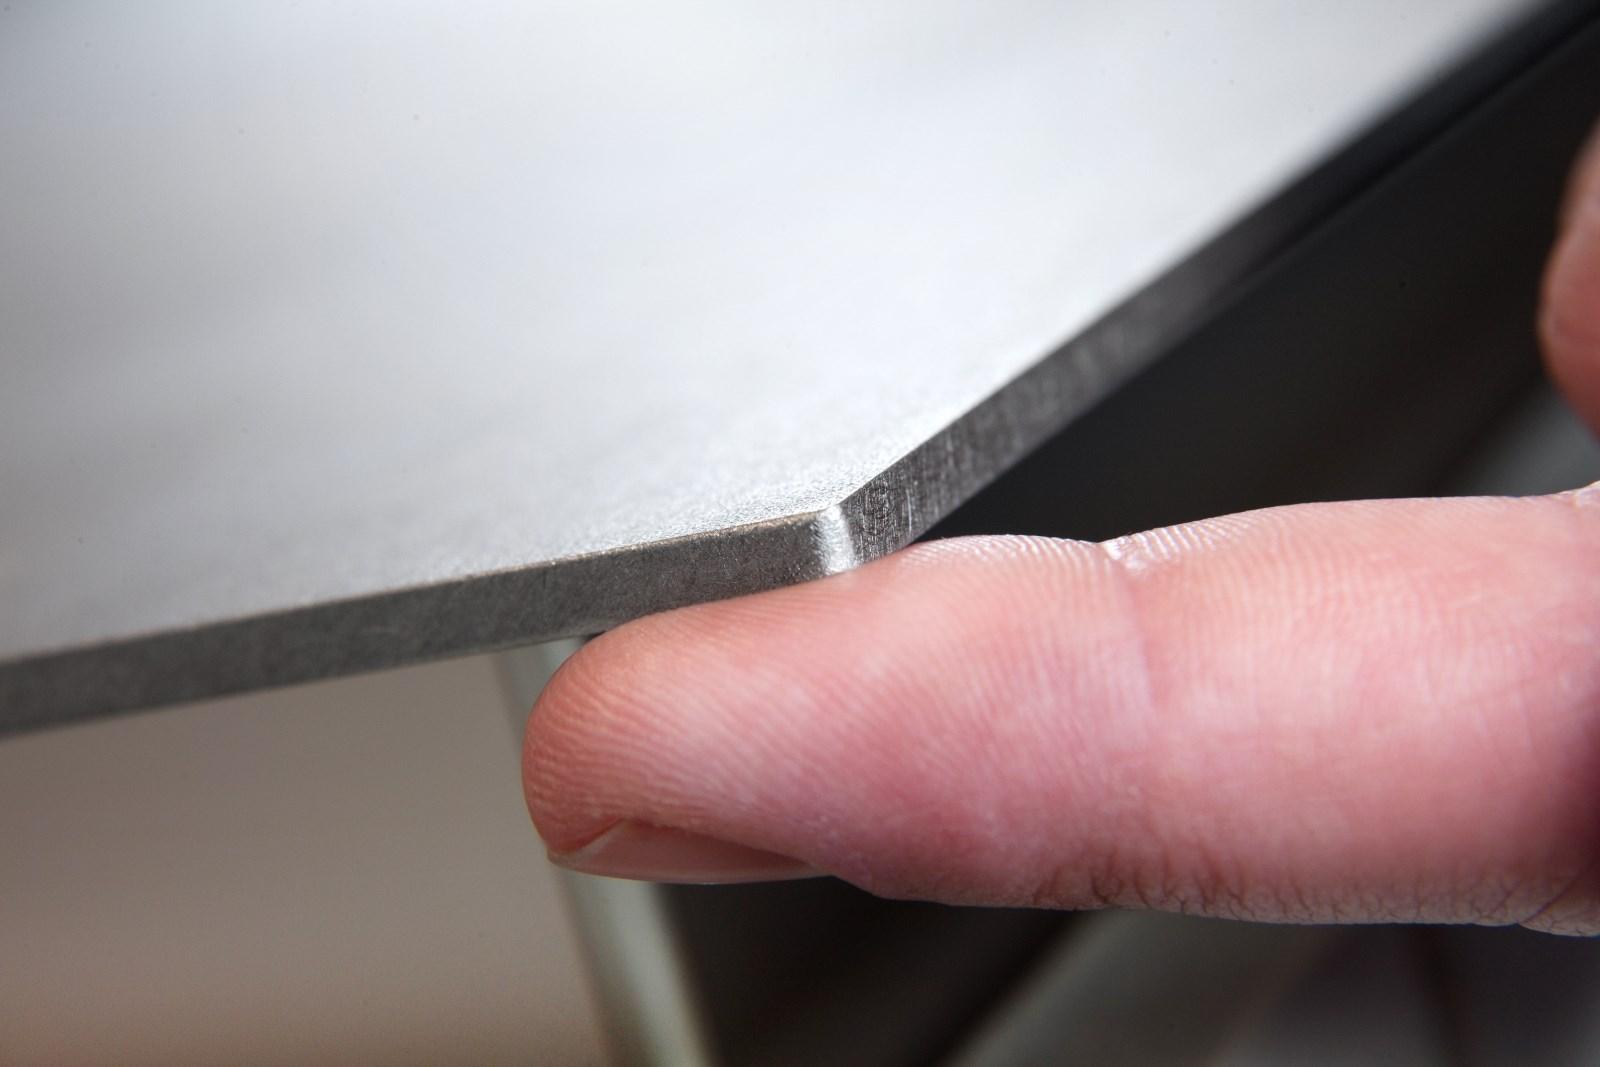 Plan De Travail Laminé plans de travail inox 4 mm massif laminés à chaud - so inox